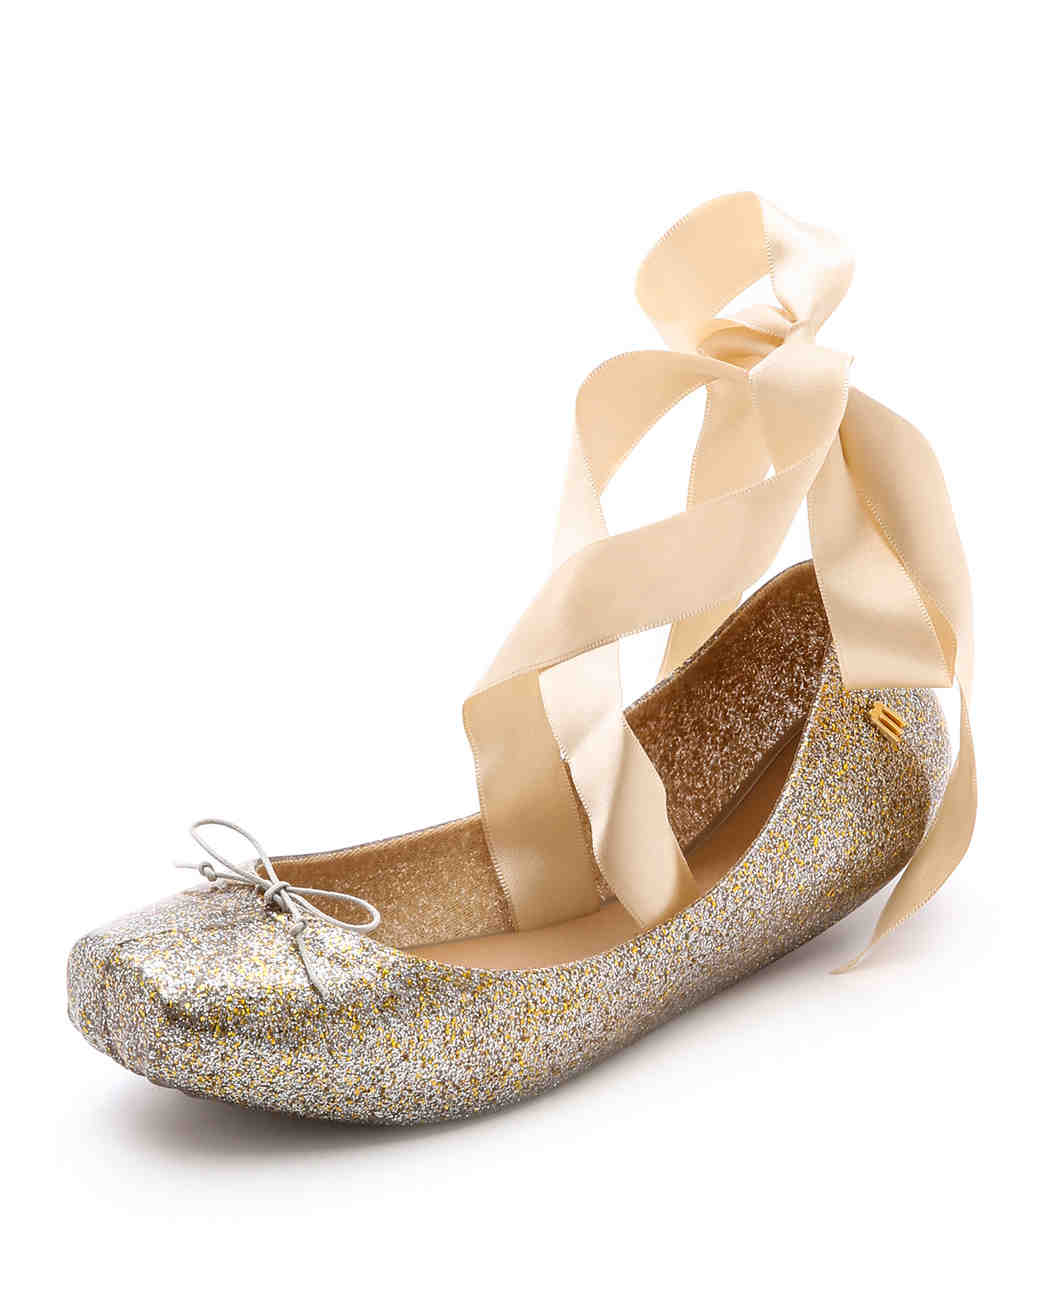 summer-wedding-shoes-melissa-lace-up-ballet-flats-0515.jpg